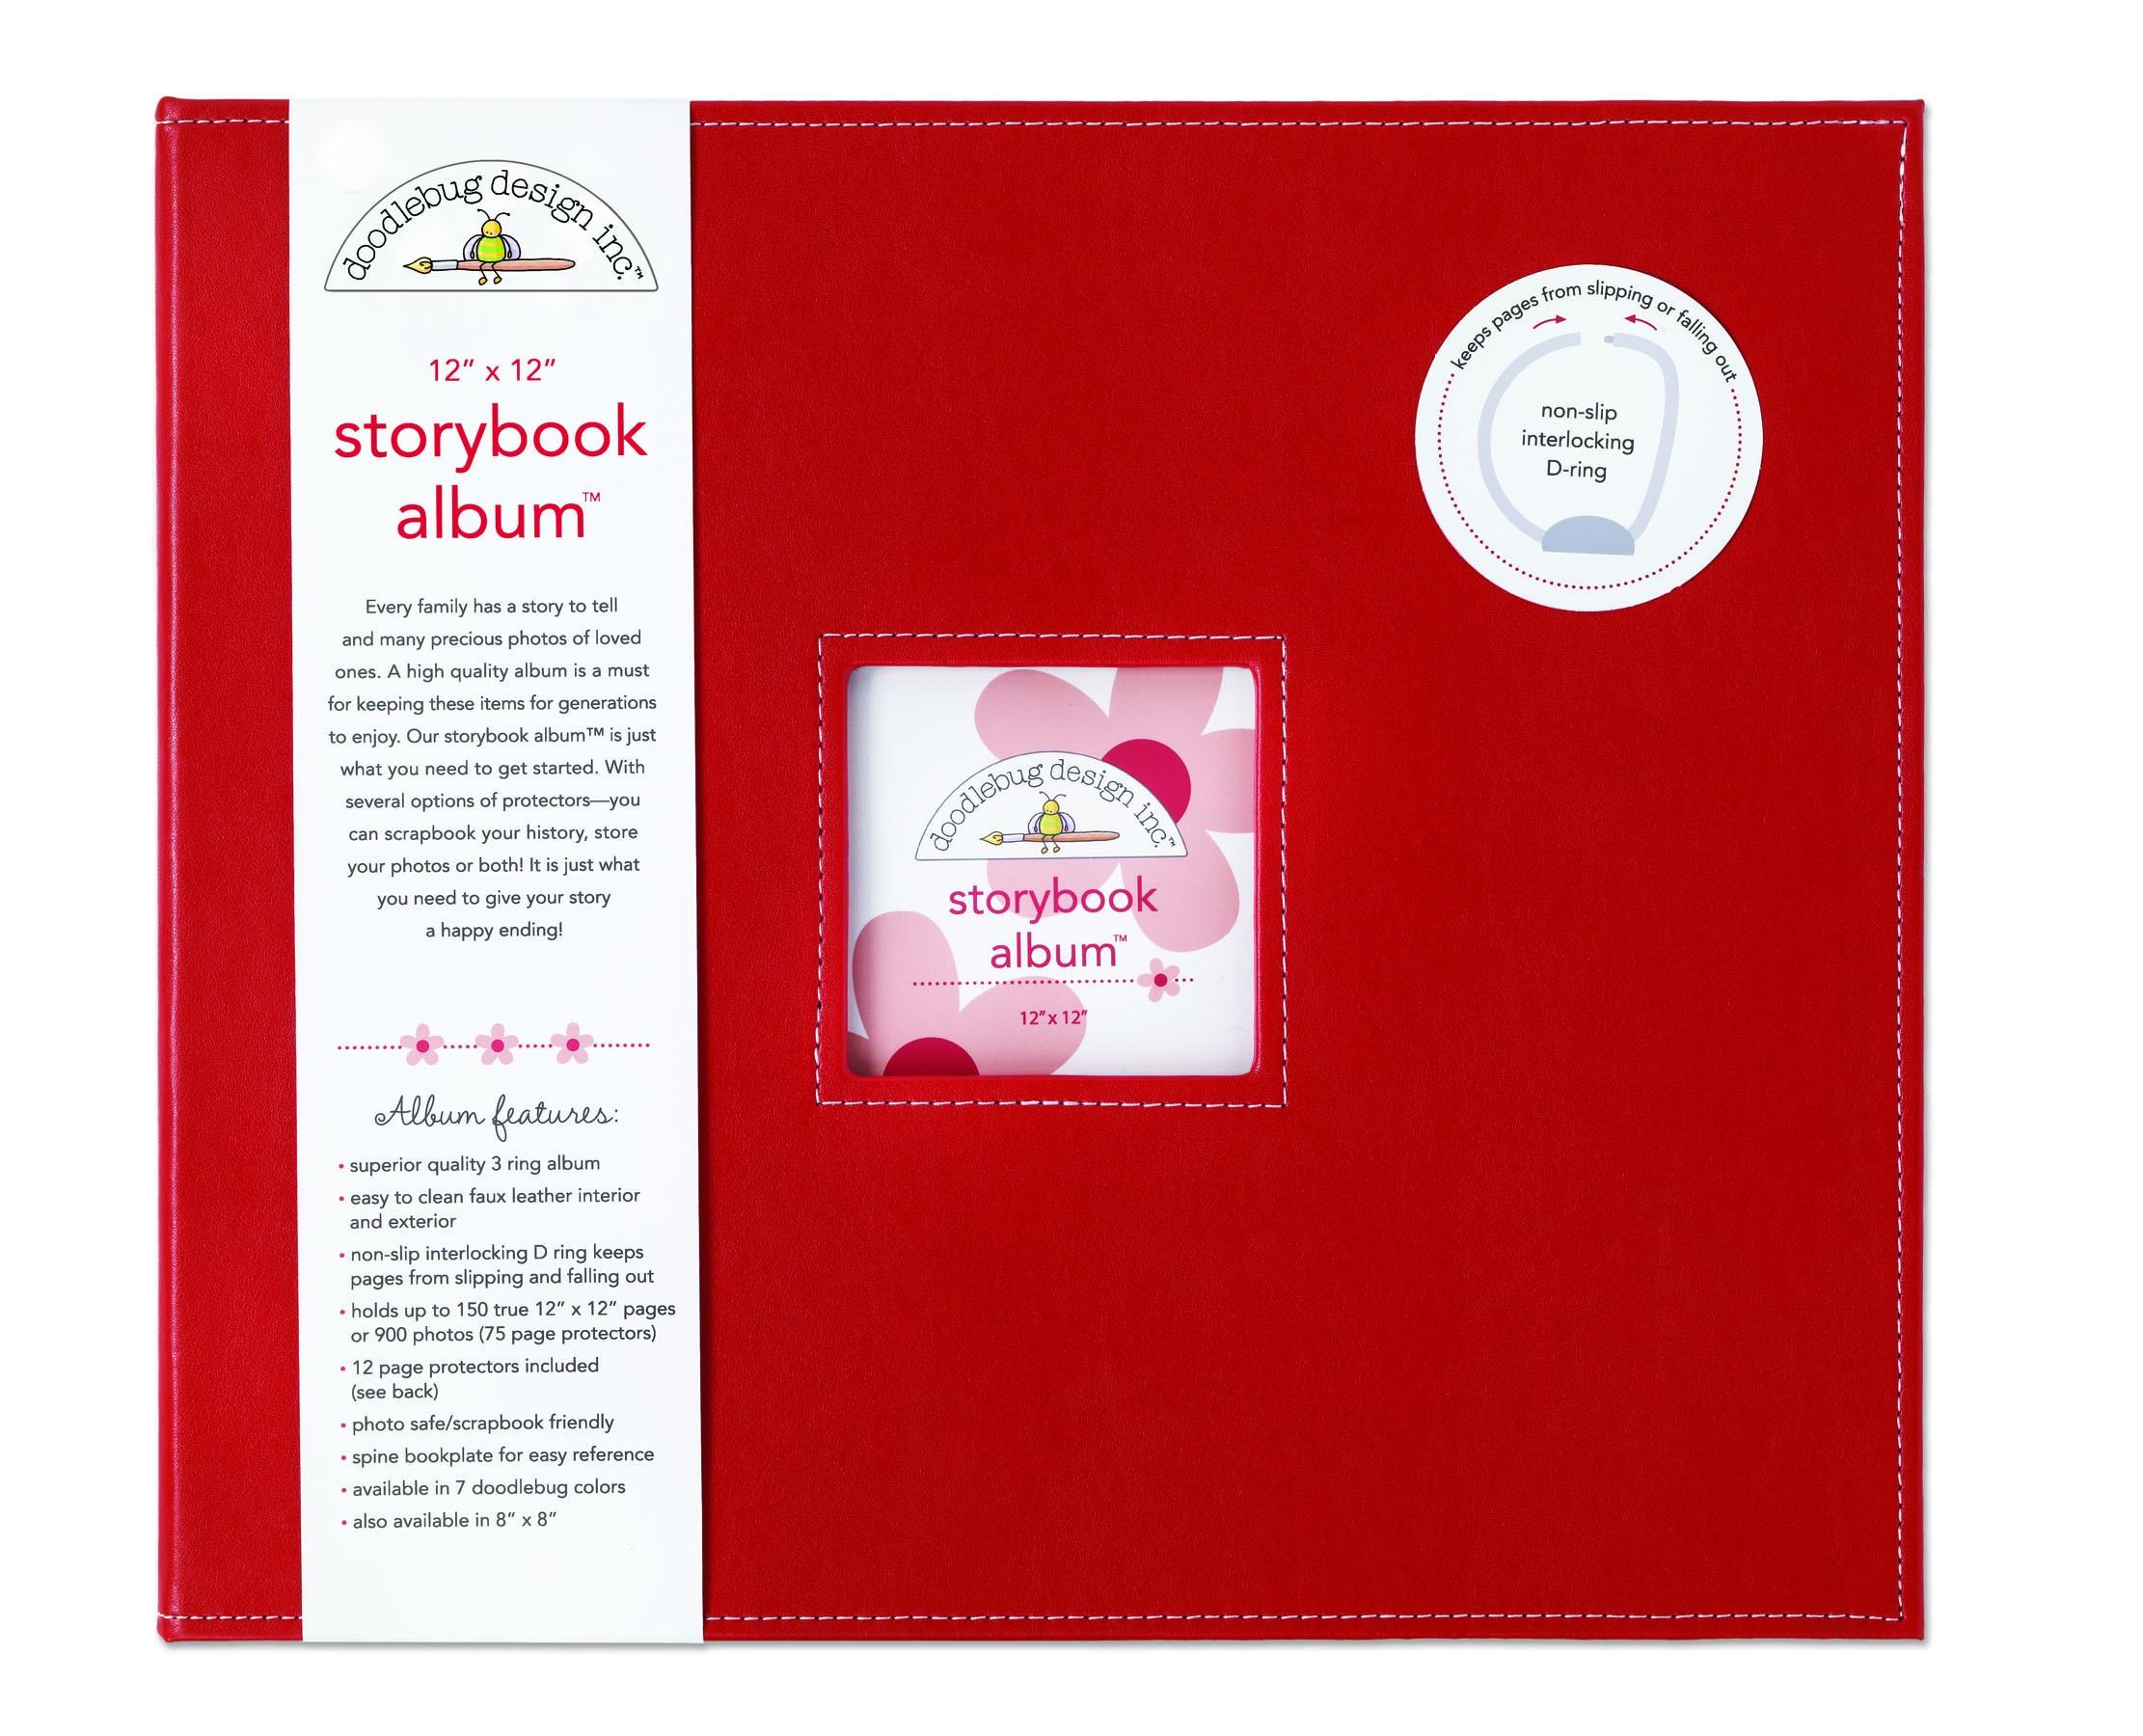 Doodlebug Bubblegum Fabric Storybook Album 12 x 12 e09b0284 445b 4534 b395 24f4e37c0289